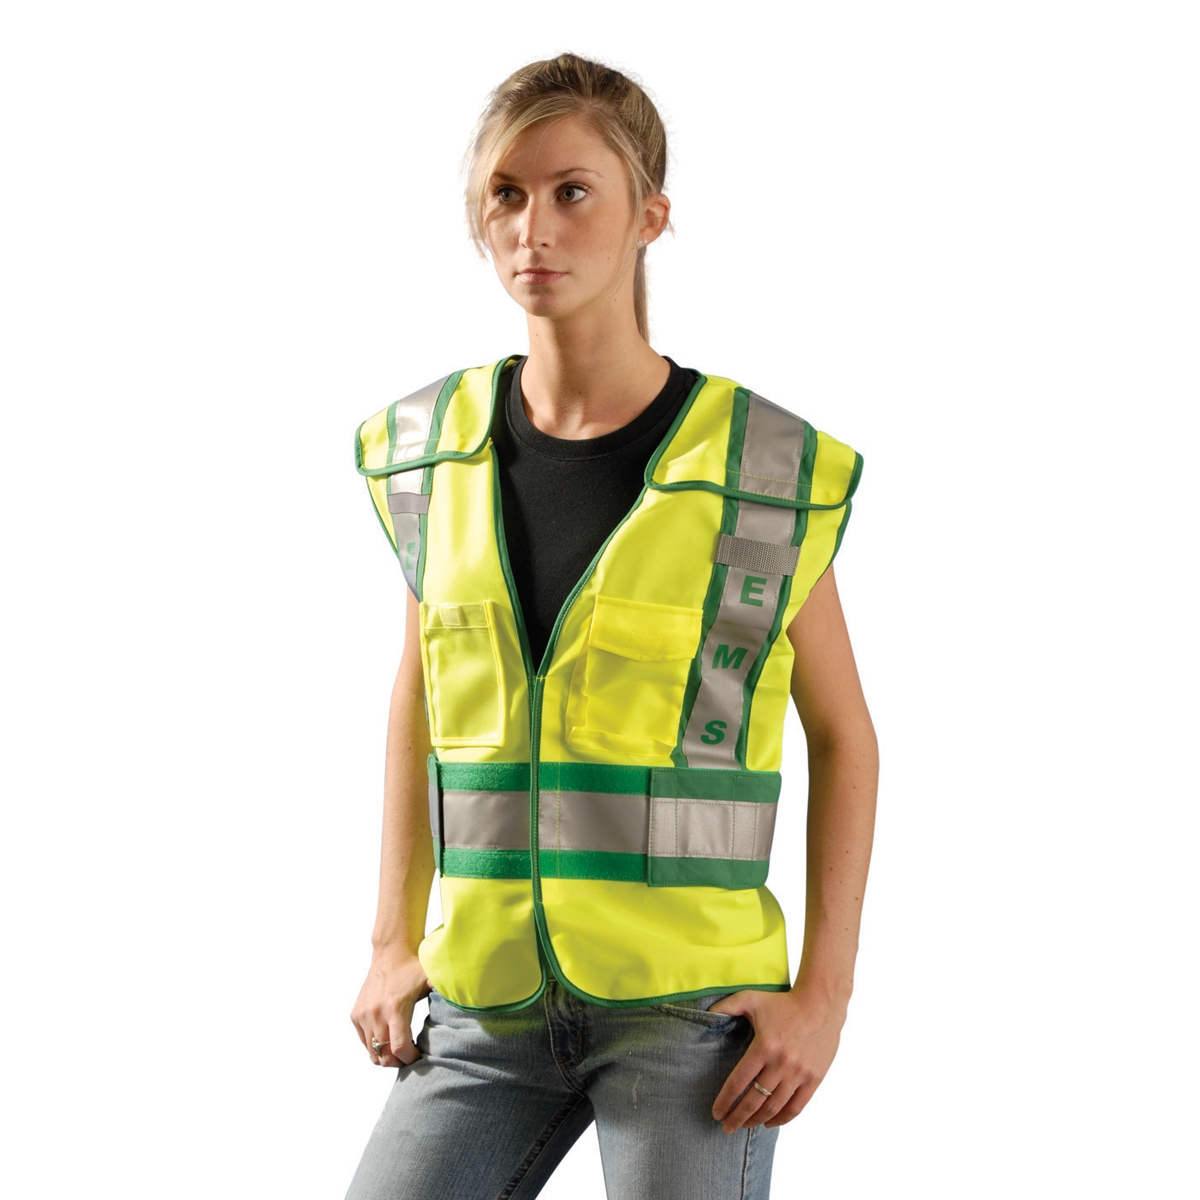 Occunomix Lux Pse Ansi 207 Solid Public Ems Safety Vest